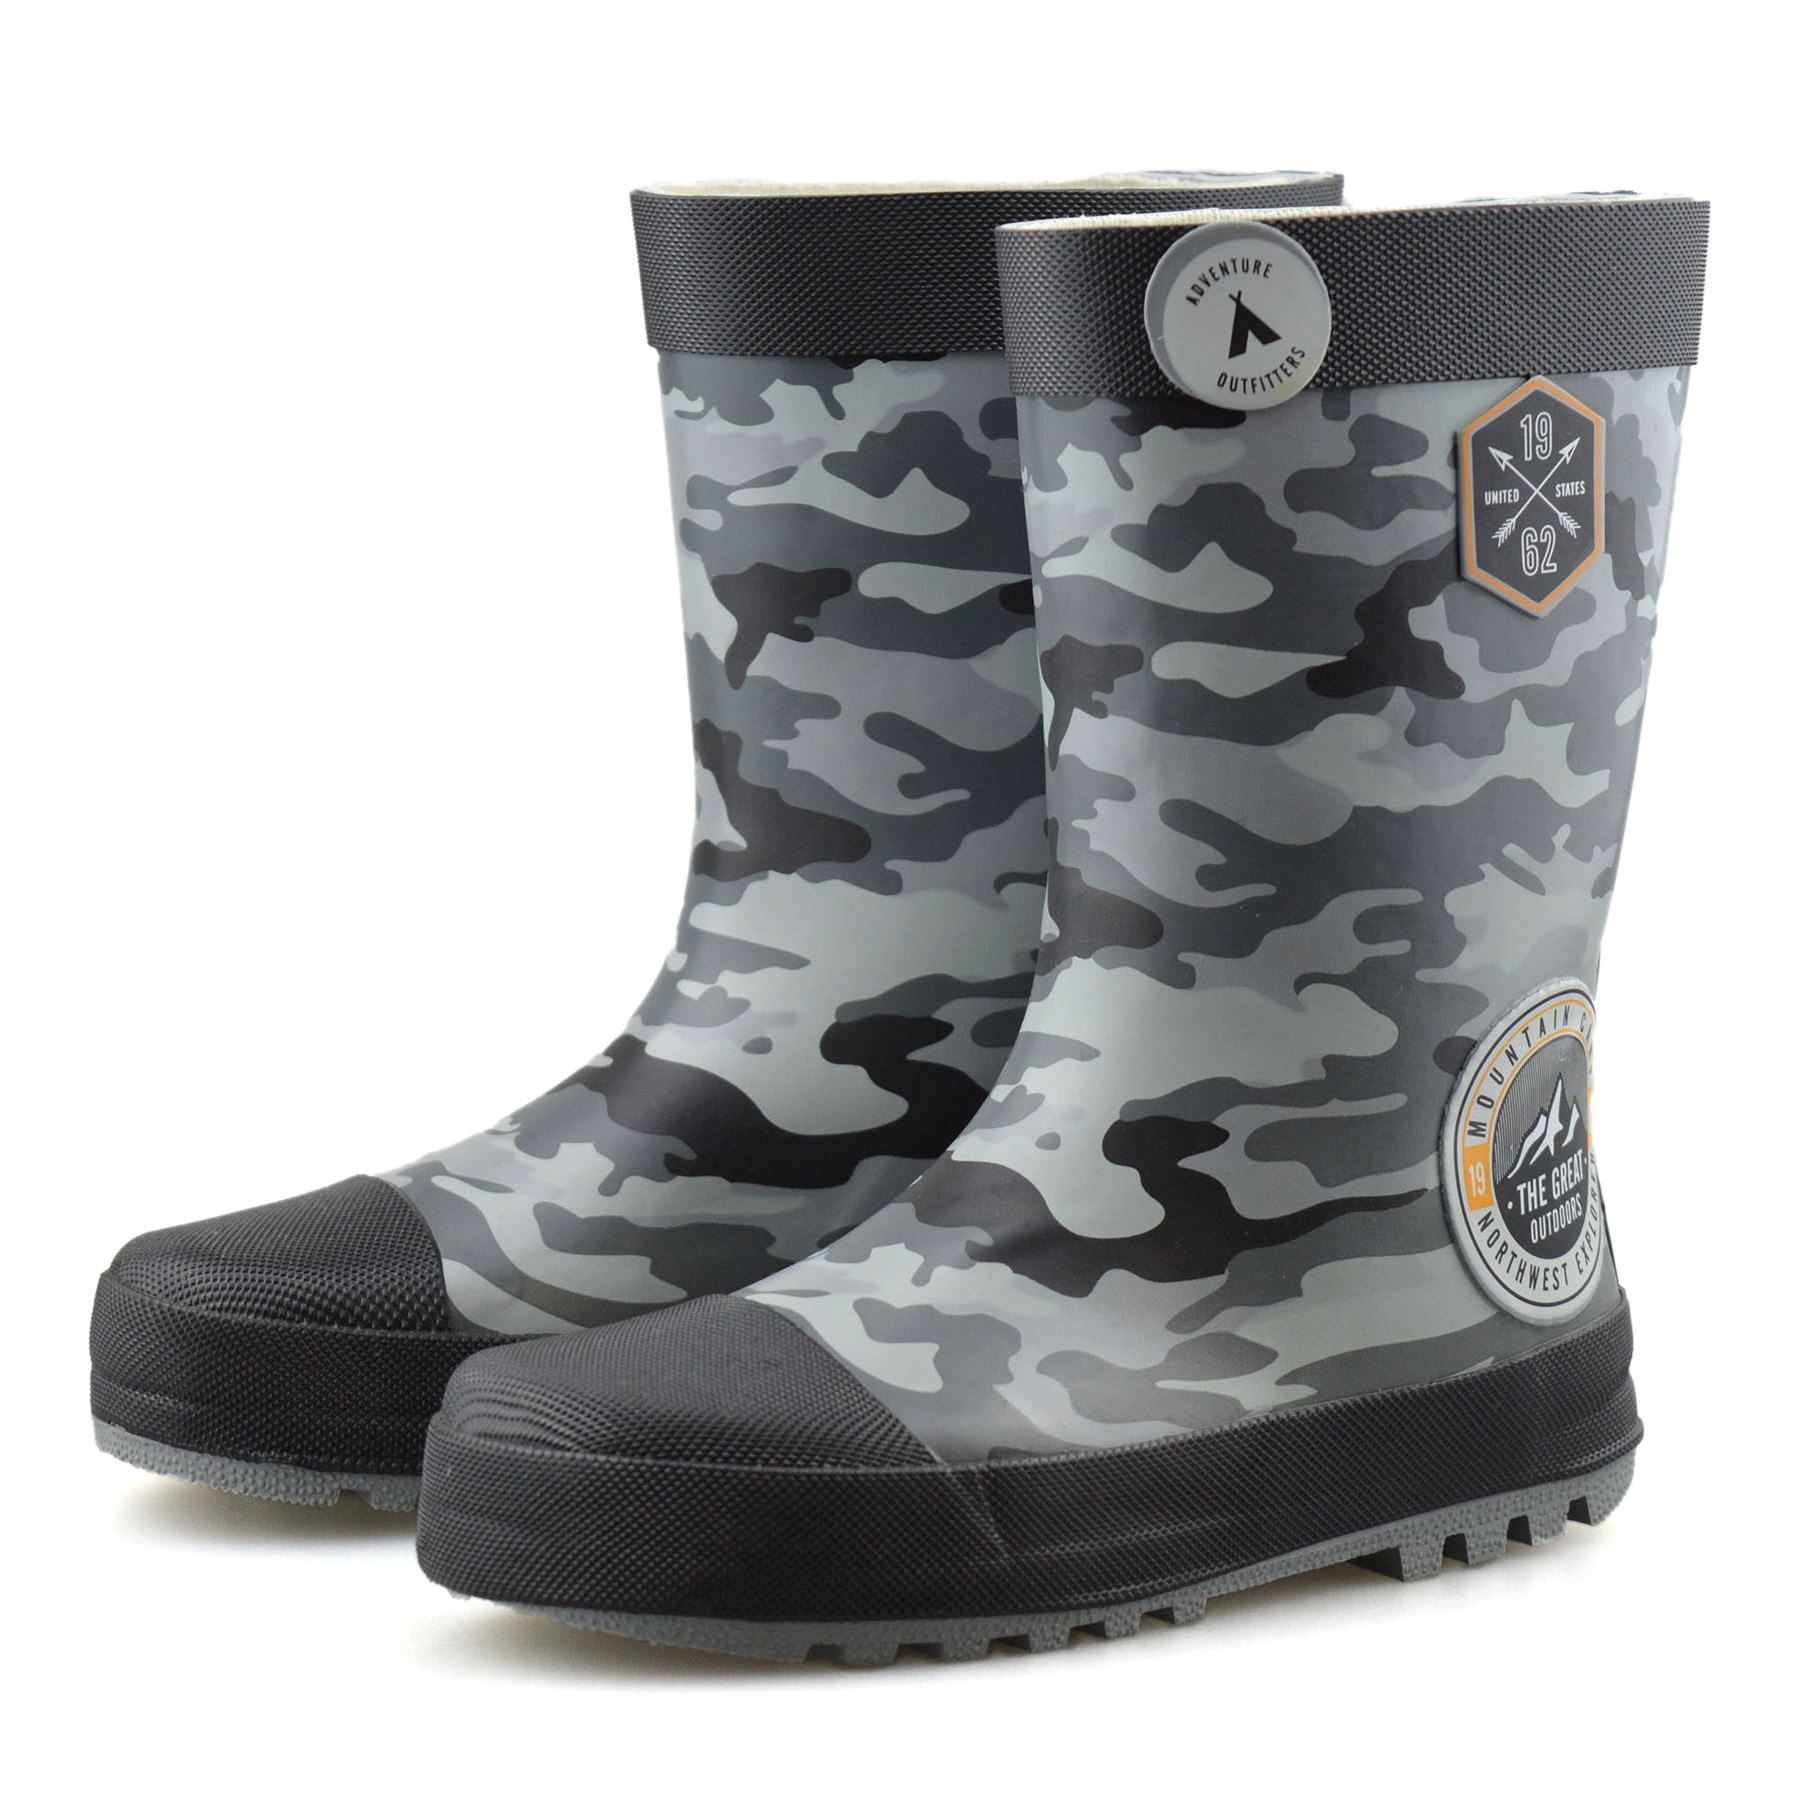 Boys Girls Waterproof Wellies Kids Winter Rain Snow Wellingtons Boots Shoes Size